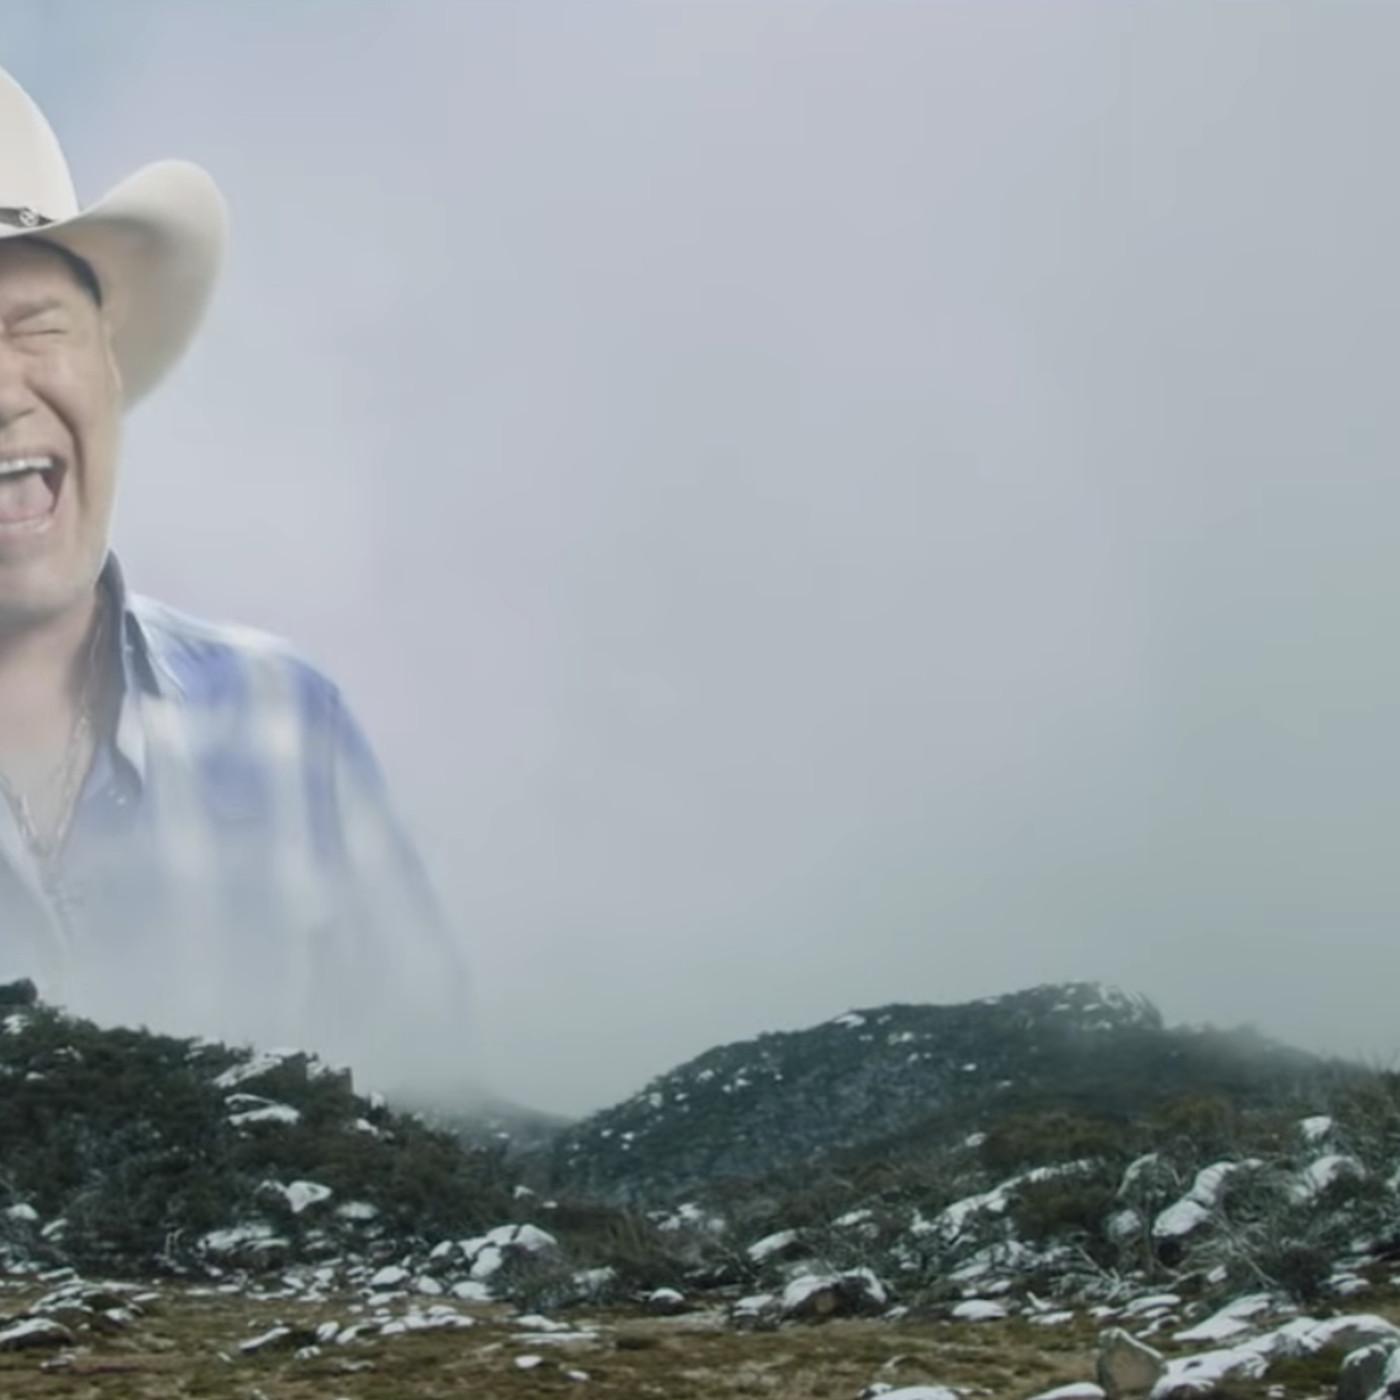 Snapchat's new segmented lens tech makes the screaming cowboy meme